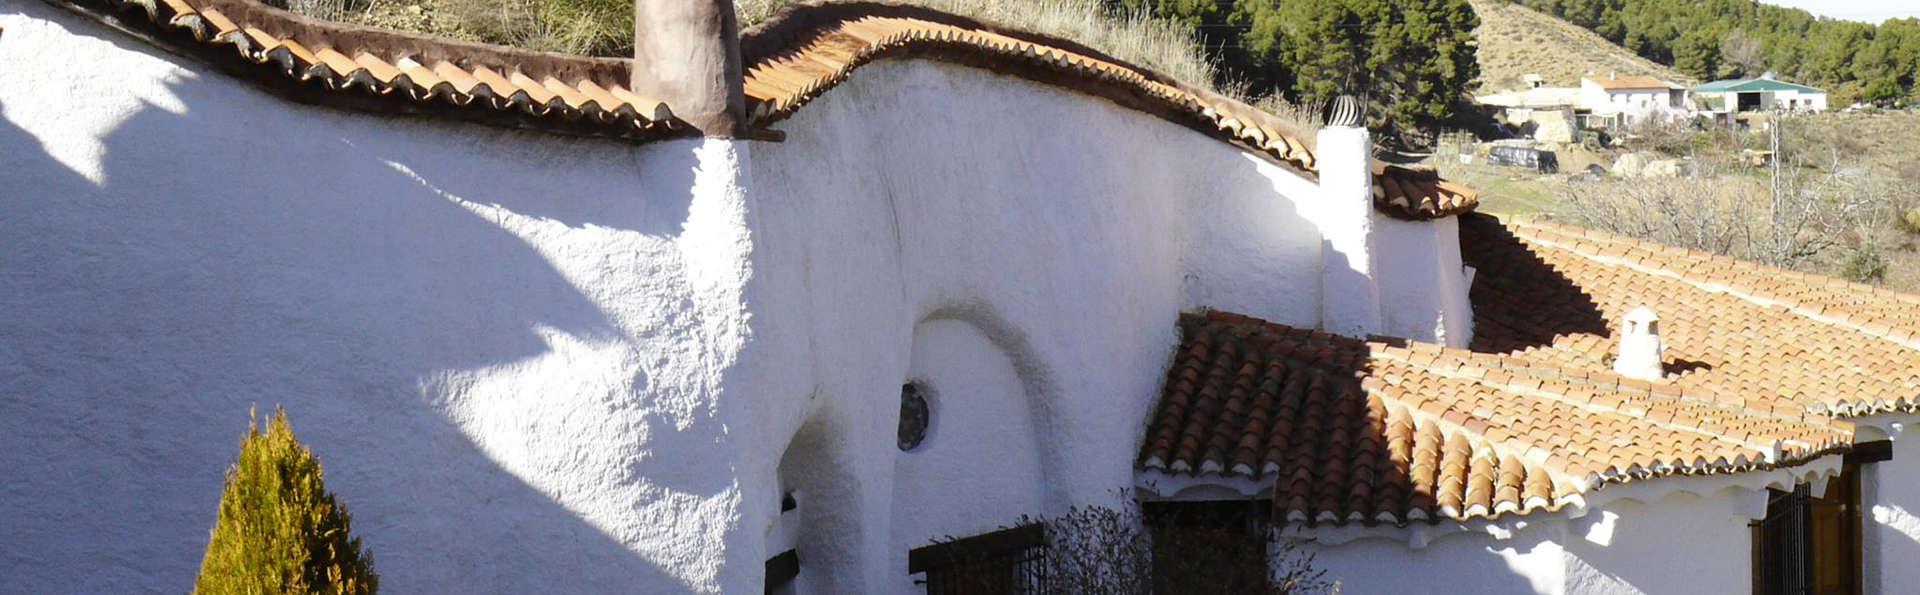 Cuevas del Zenete - EDIT_front.jpg